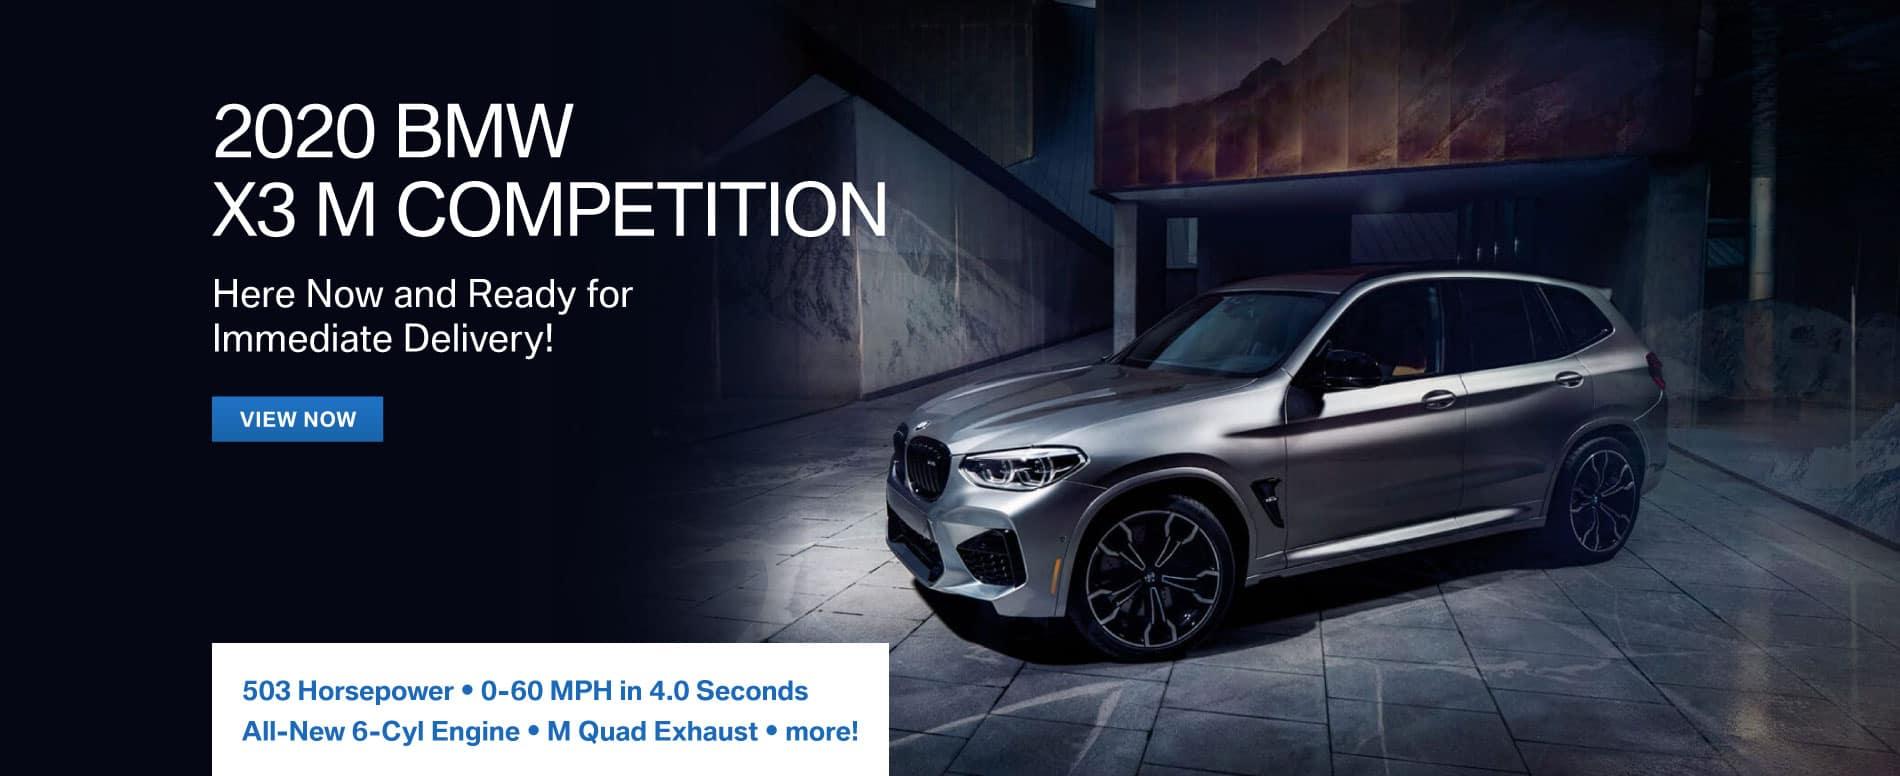 BMW of San Francisco | BMW Dealer in San Francisco, CA